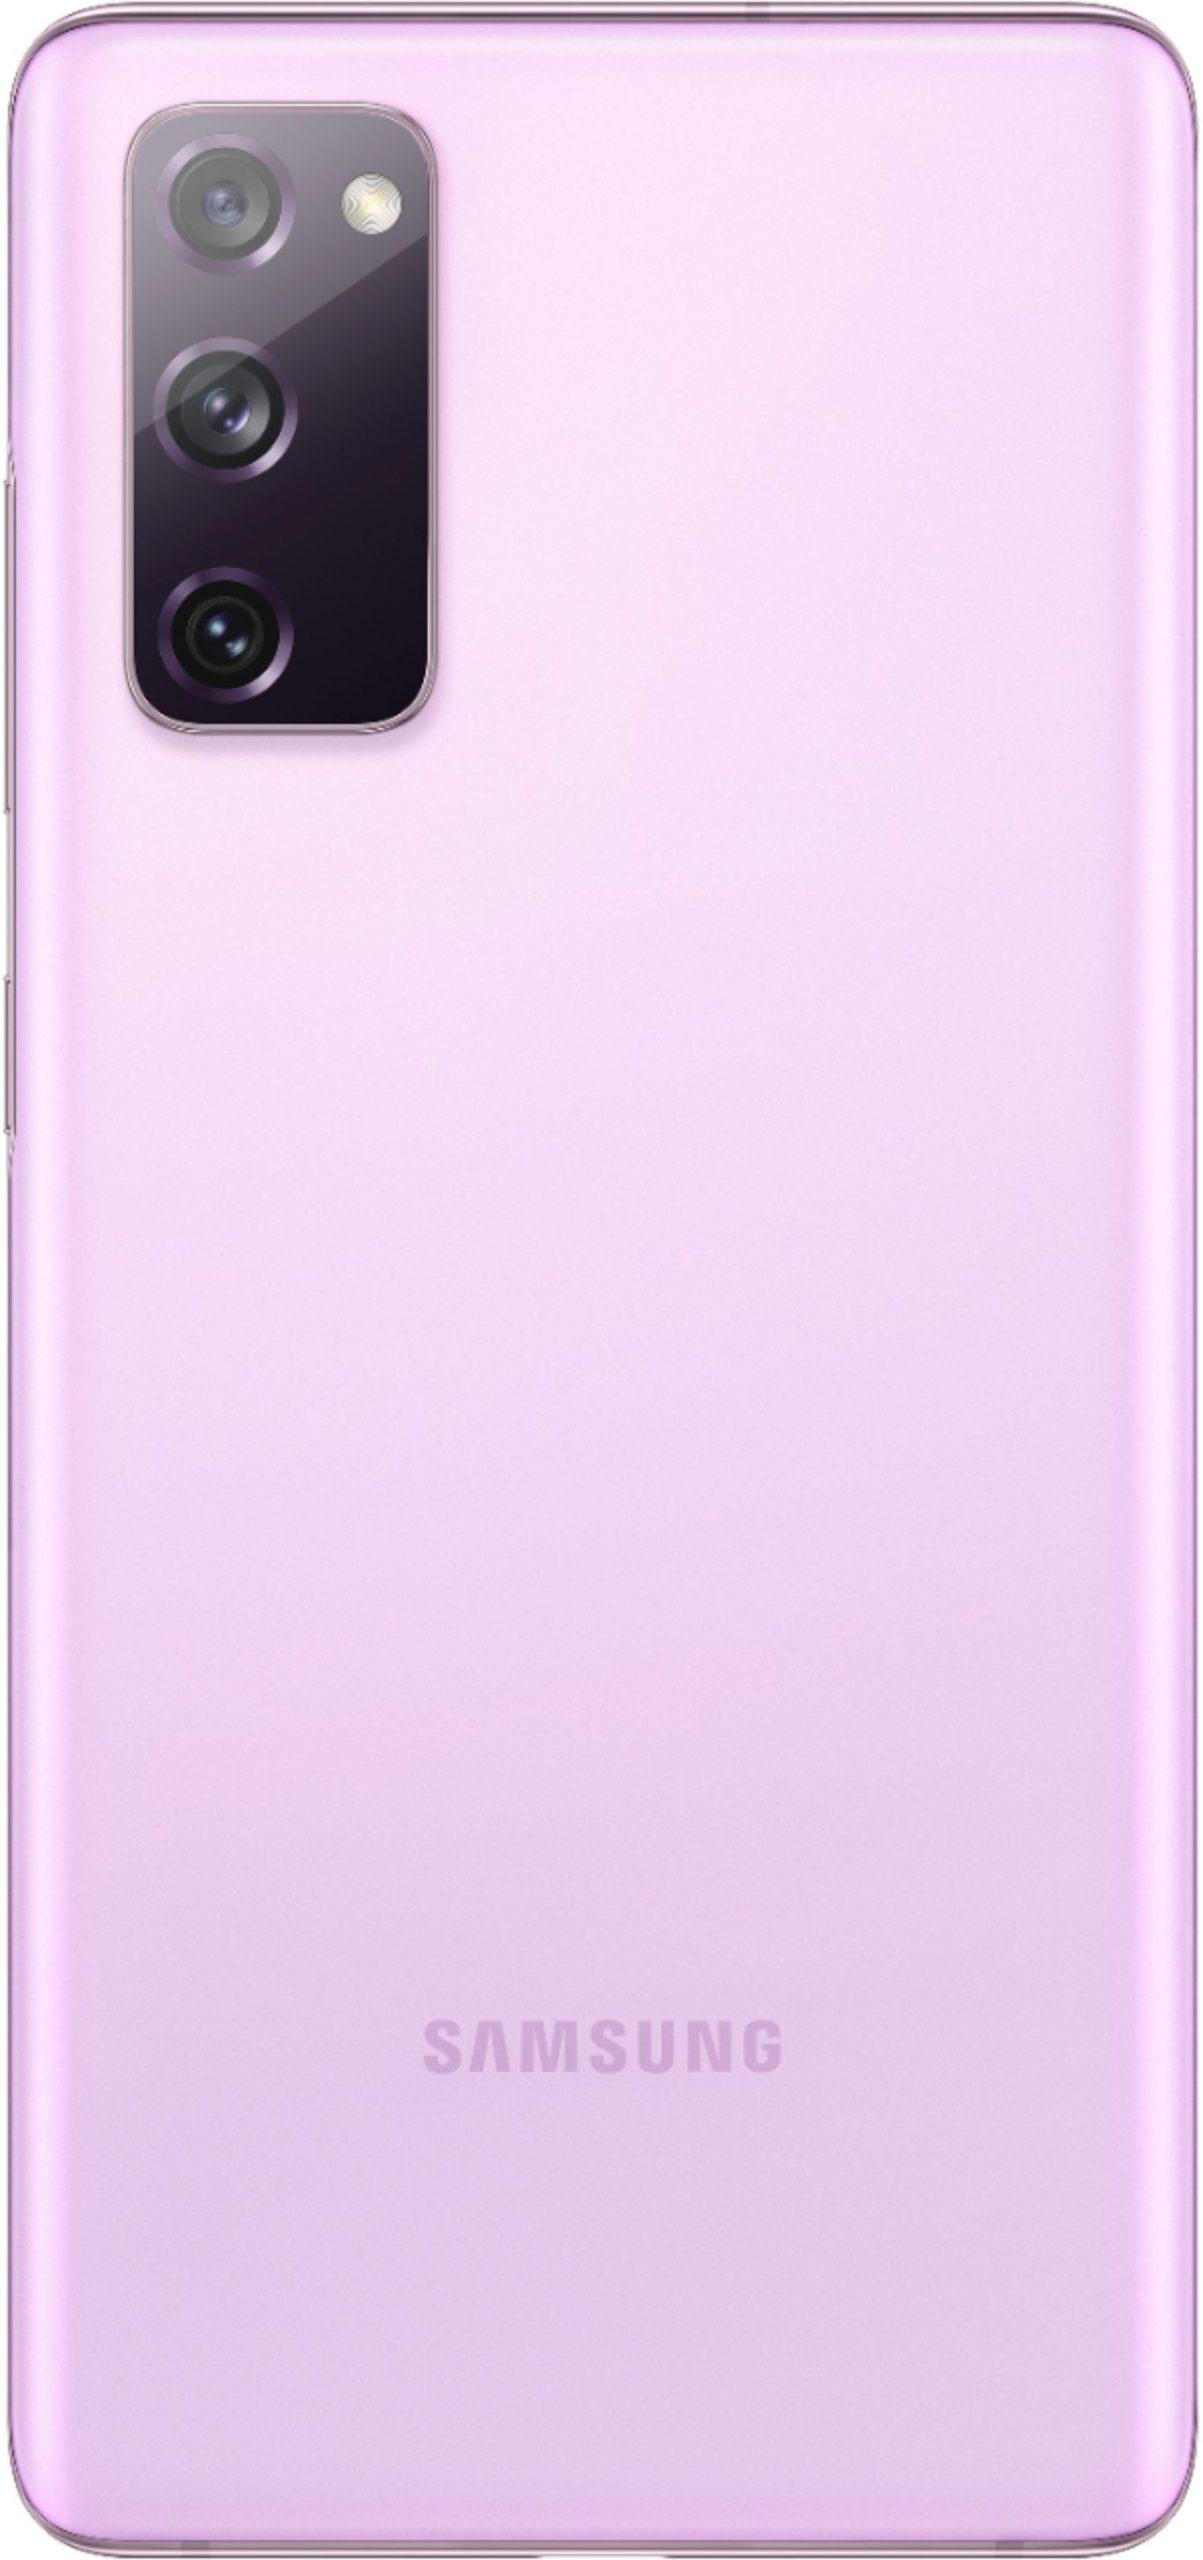 Samsung Galaxy S20 FE (SM-G780F) Violet - 3